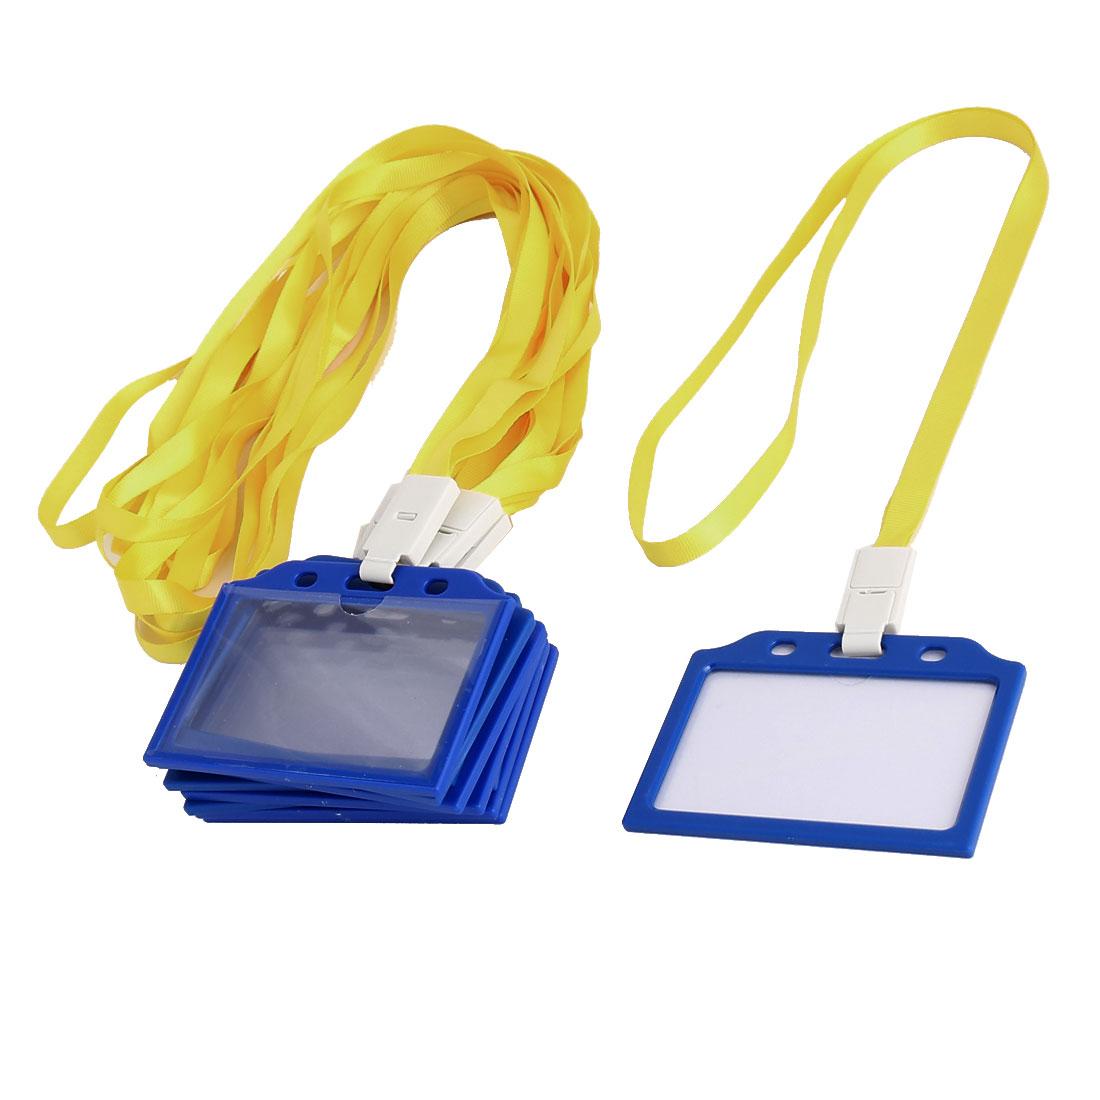 Office School Plastic Horizontal Dustproof Name Tag Holder Yellow Clear 10 Pcs